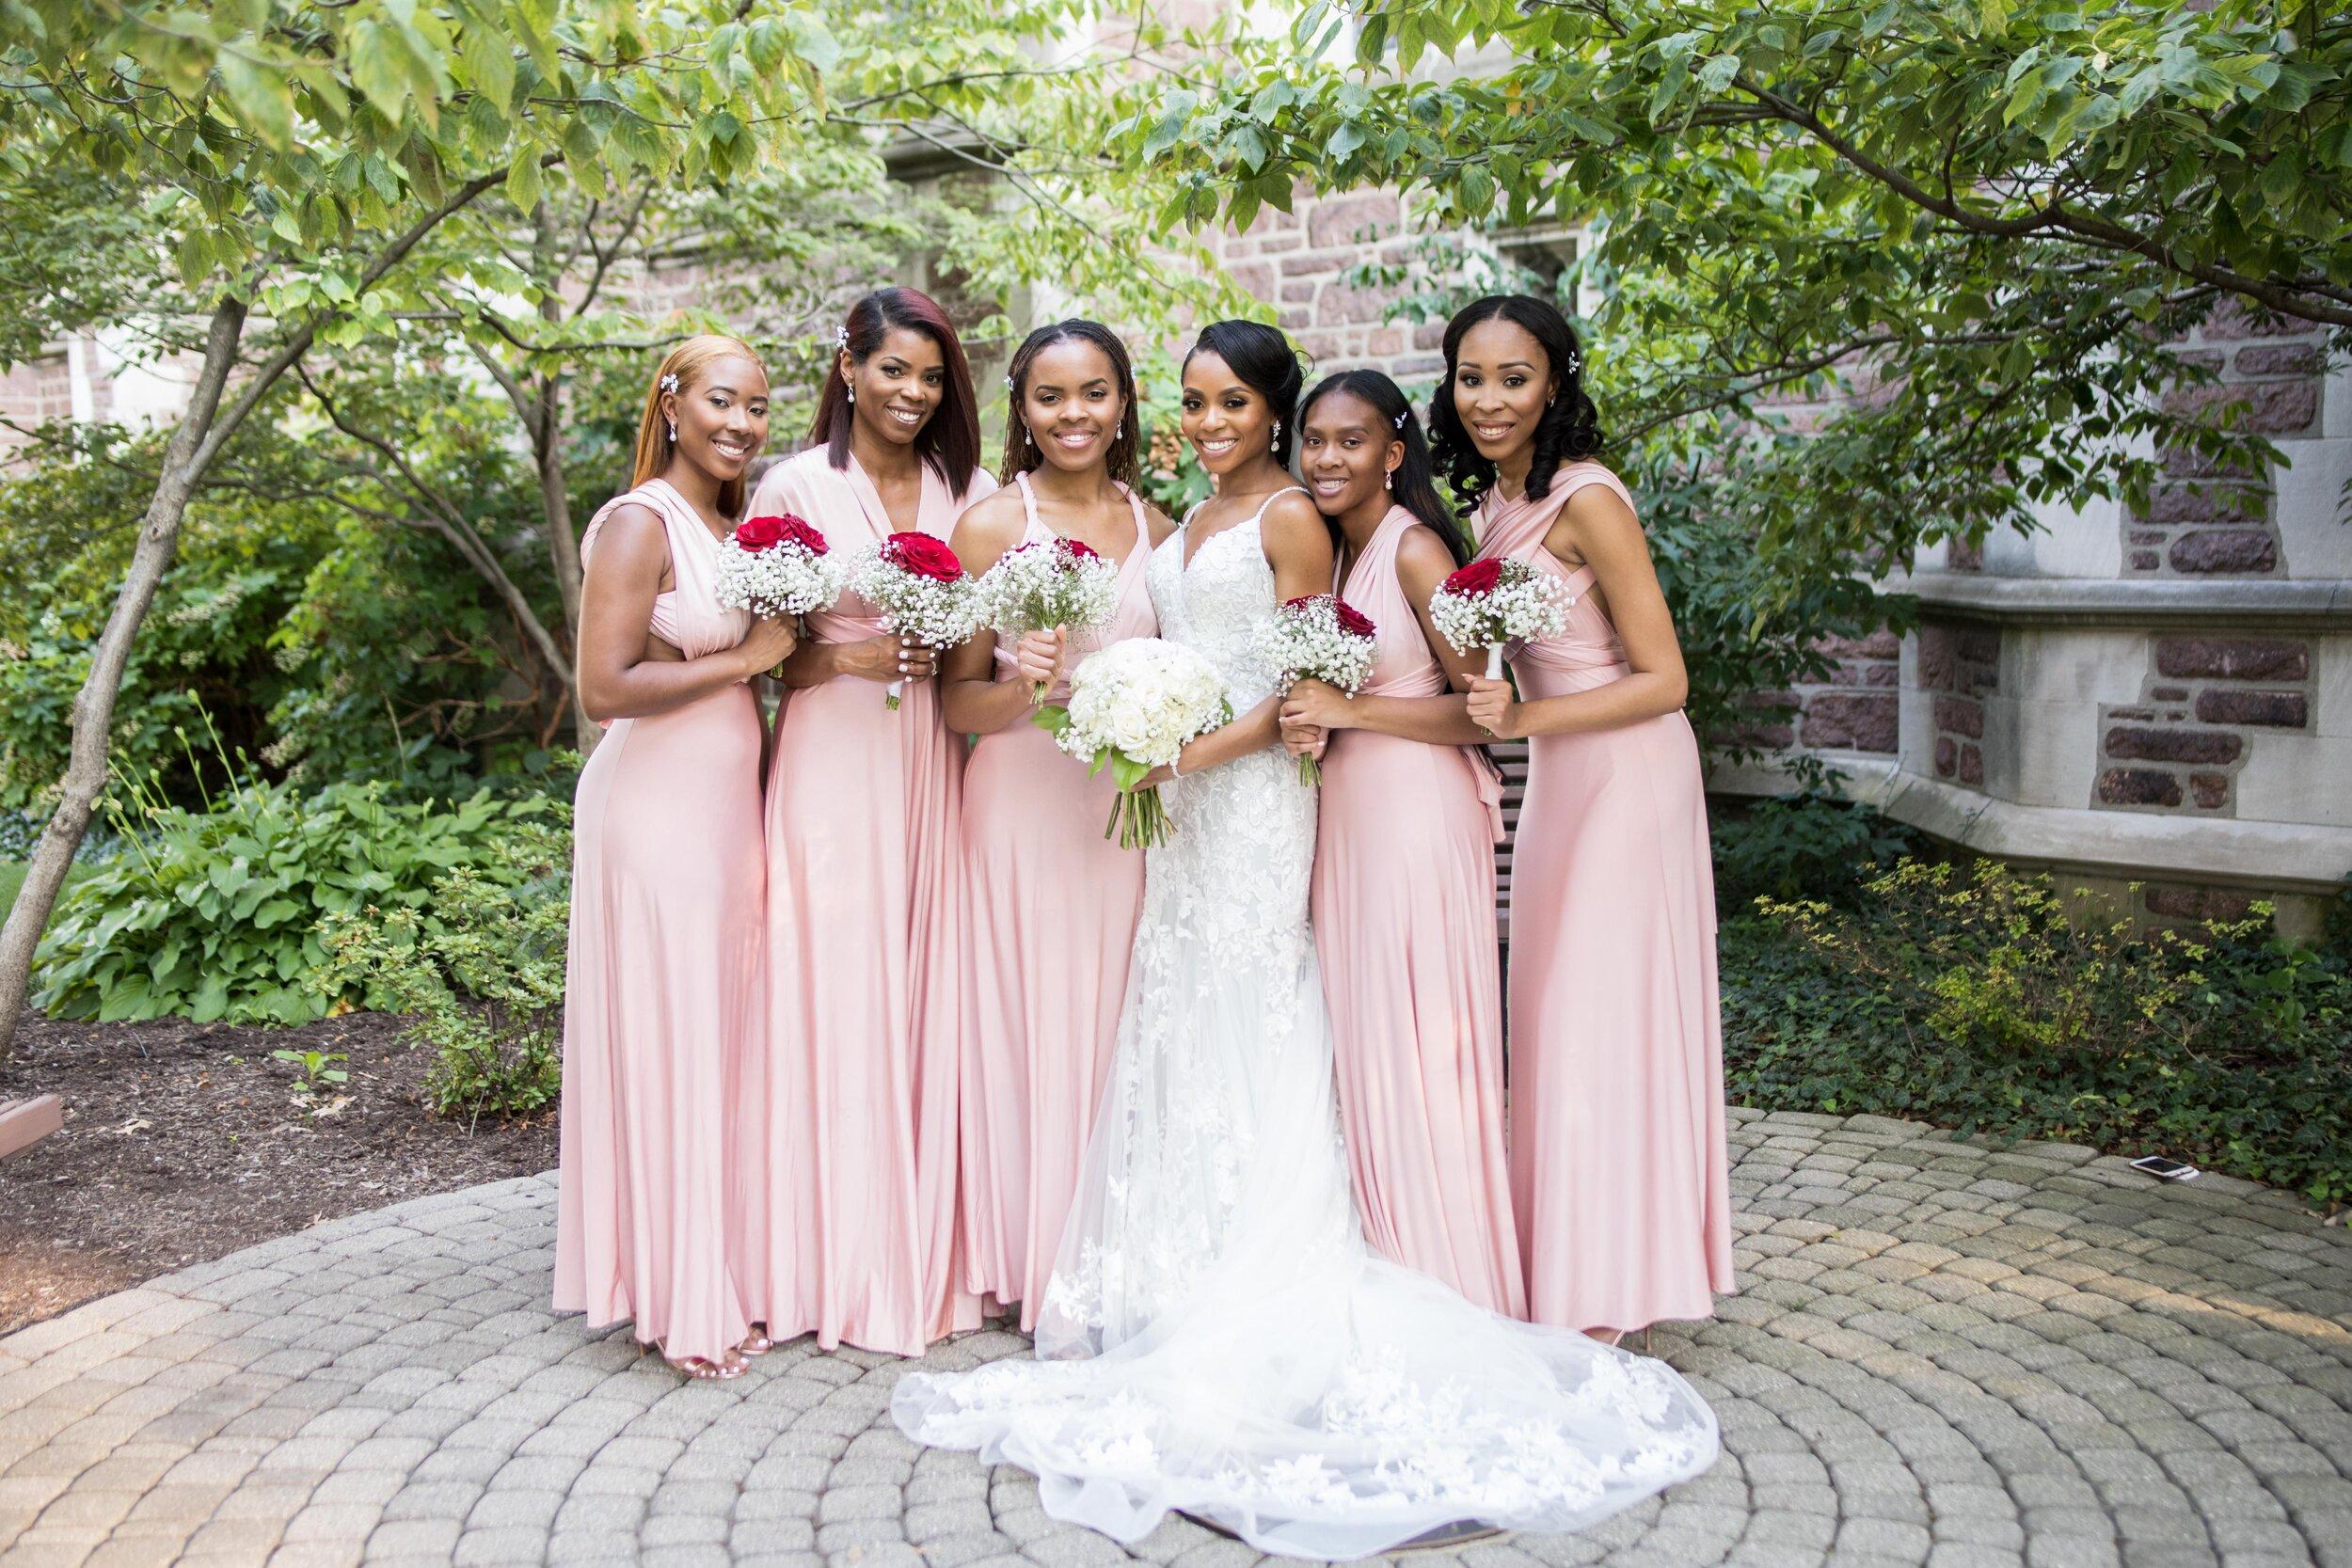 8_3_2019_BONTY_WEDDING-535.jpg